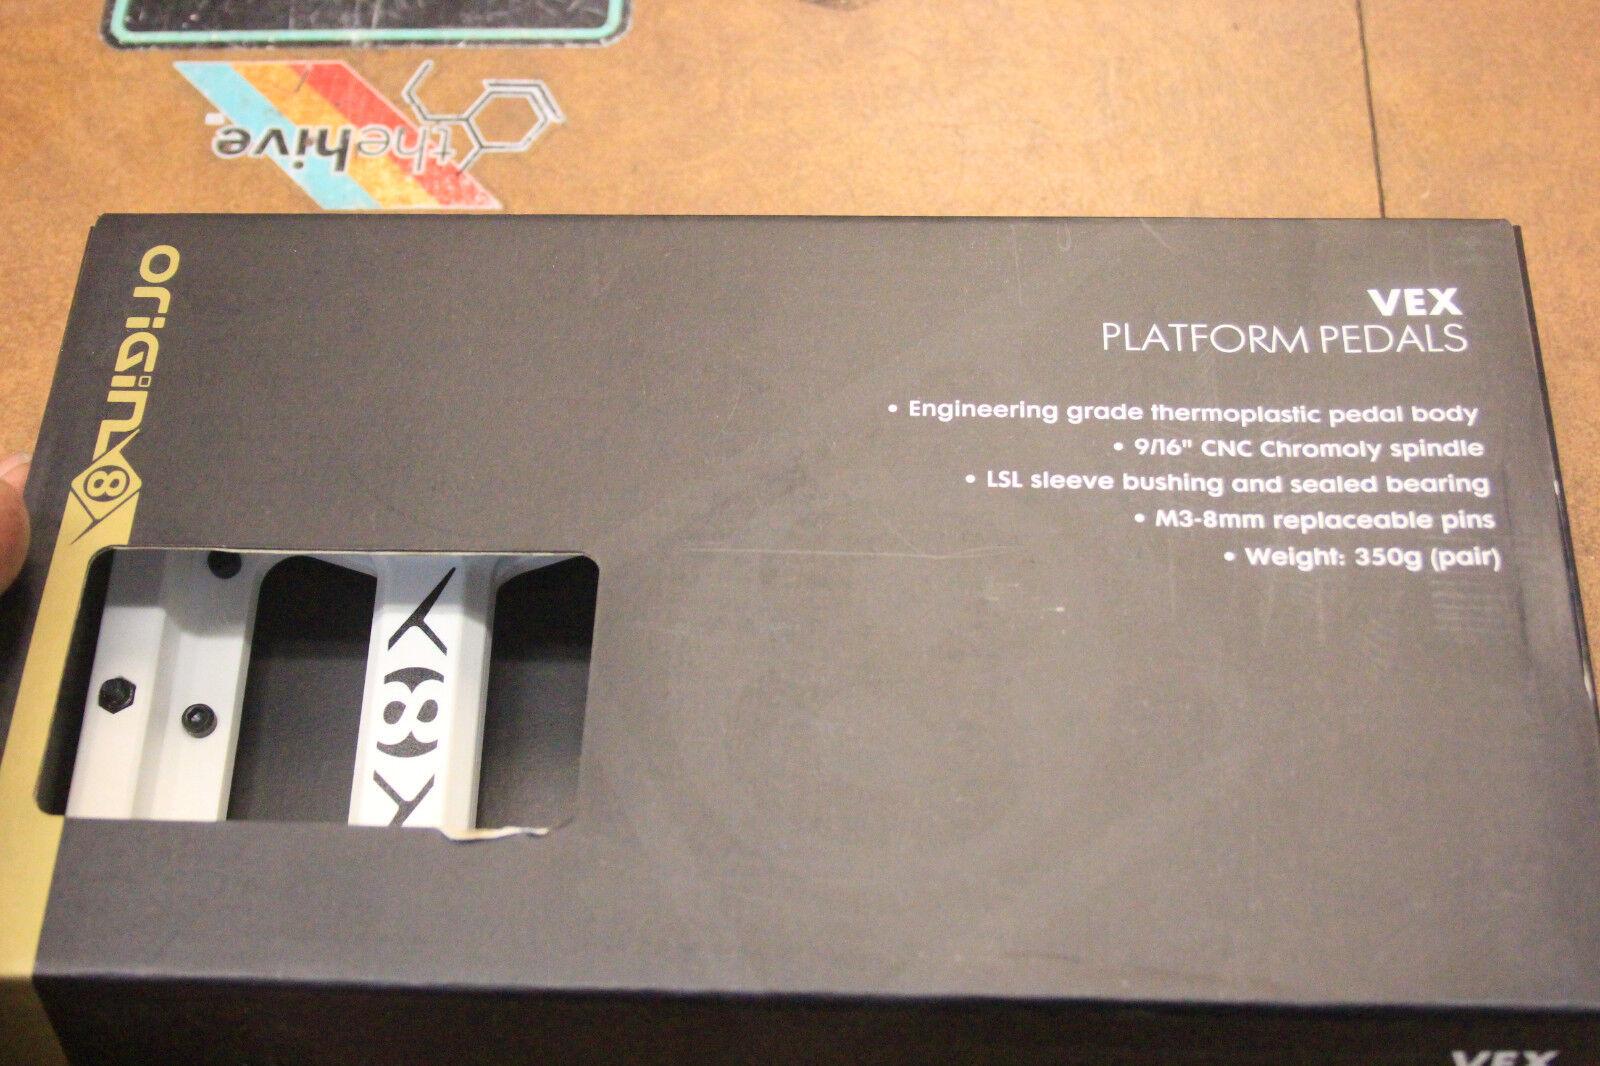 Origin8 Ultim-8 Vex Sealed Bearing Thermoplastic Platform Mountain Bike Pedals